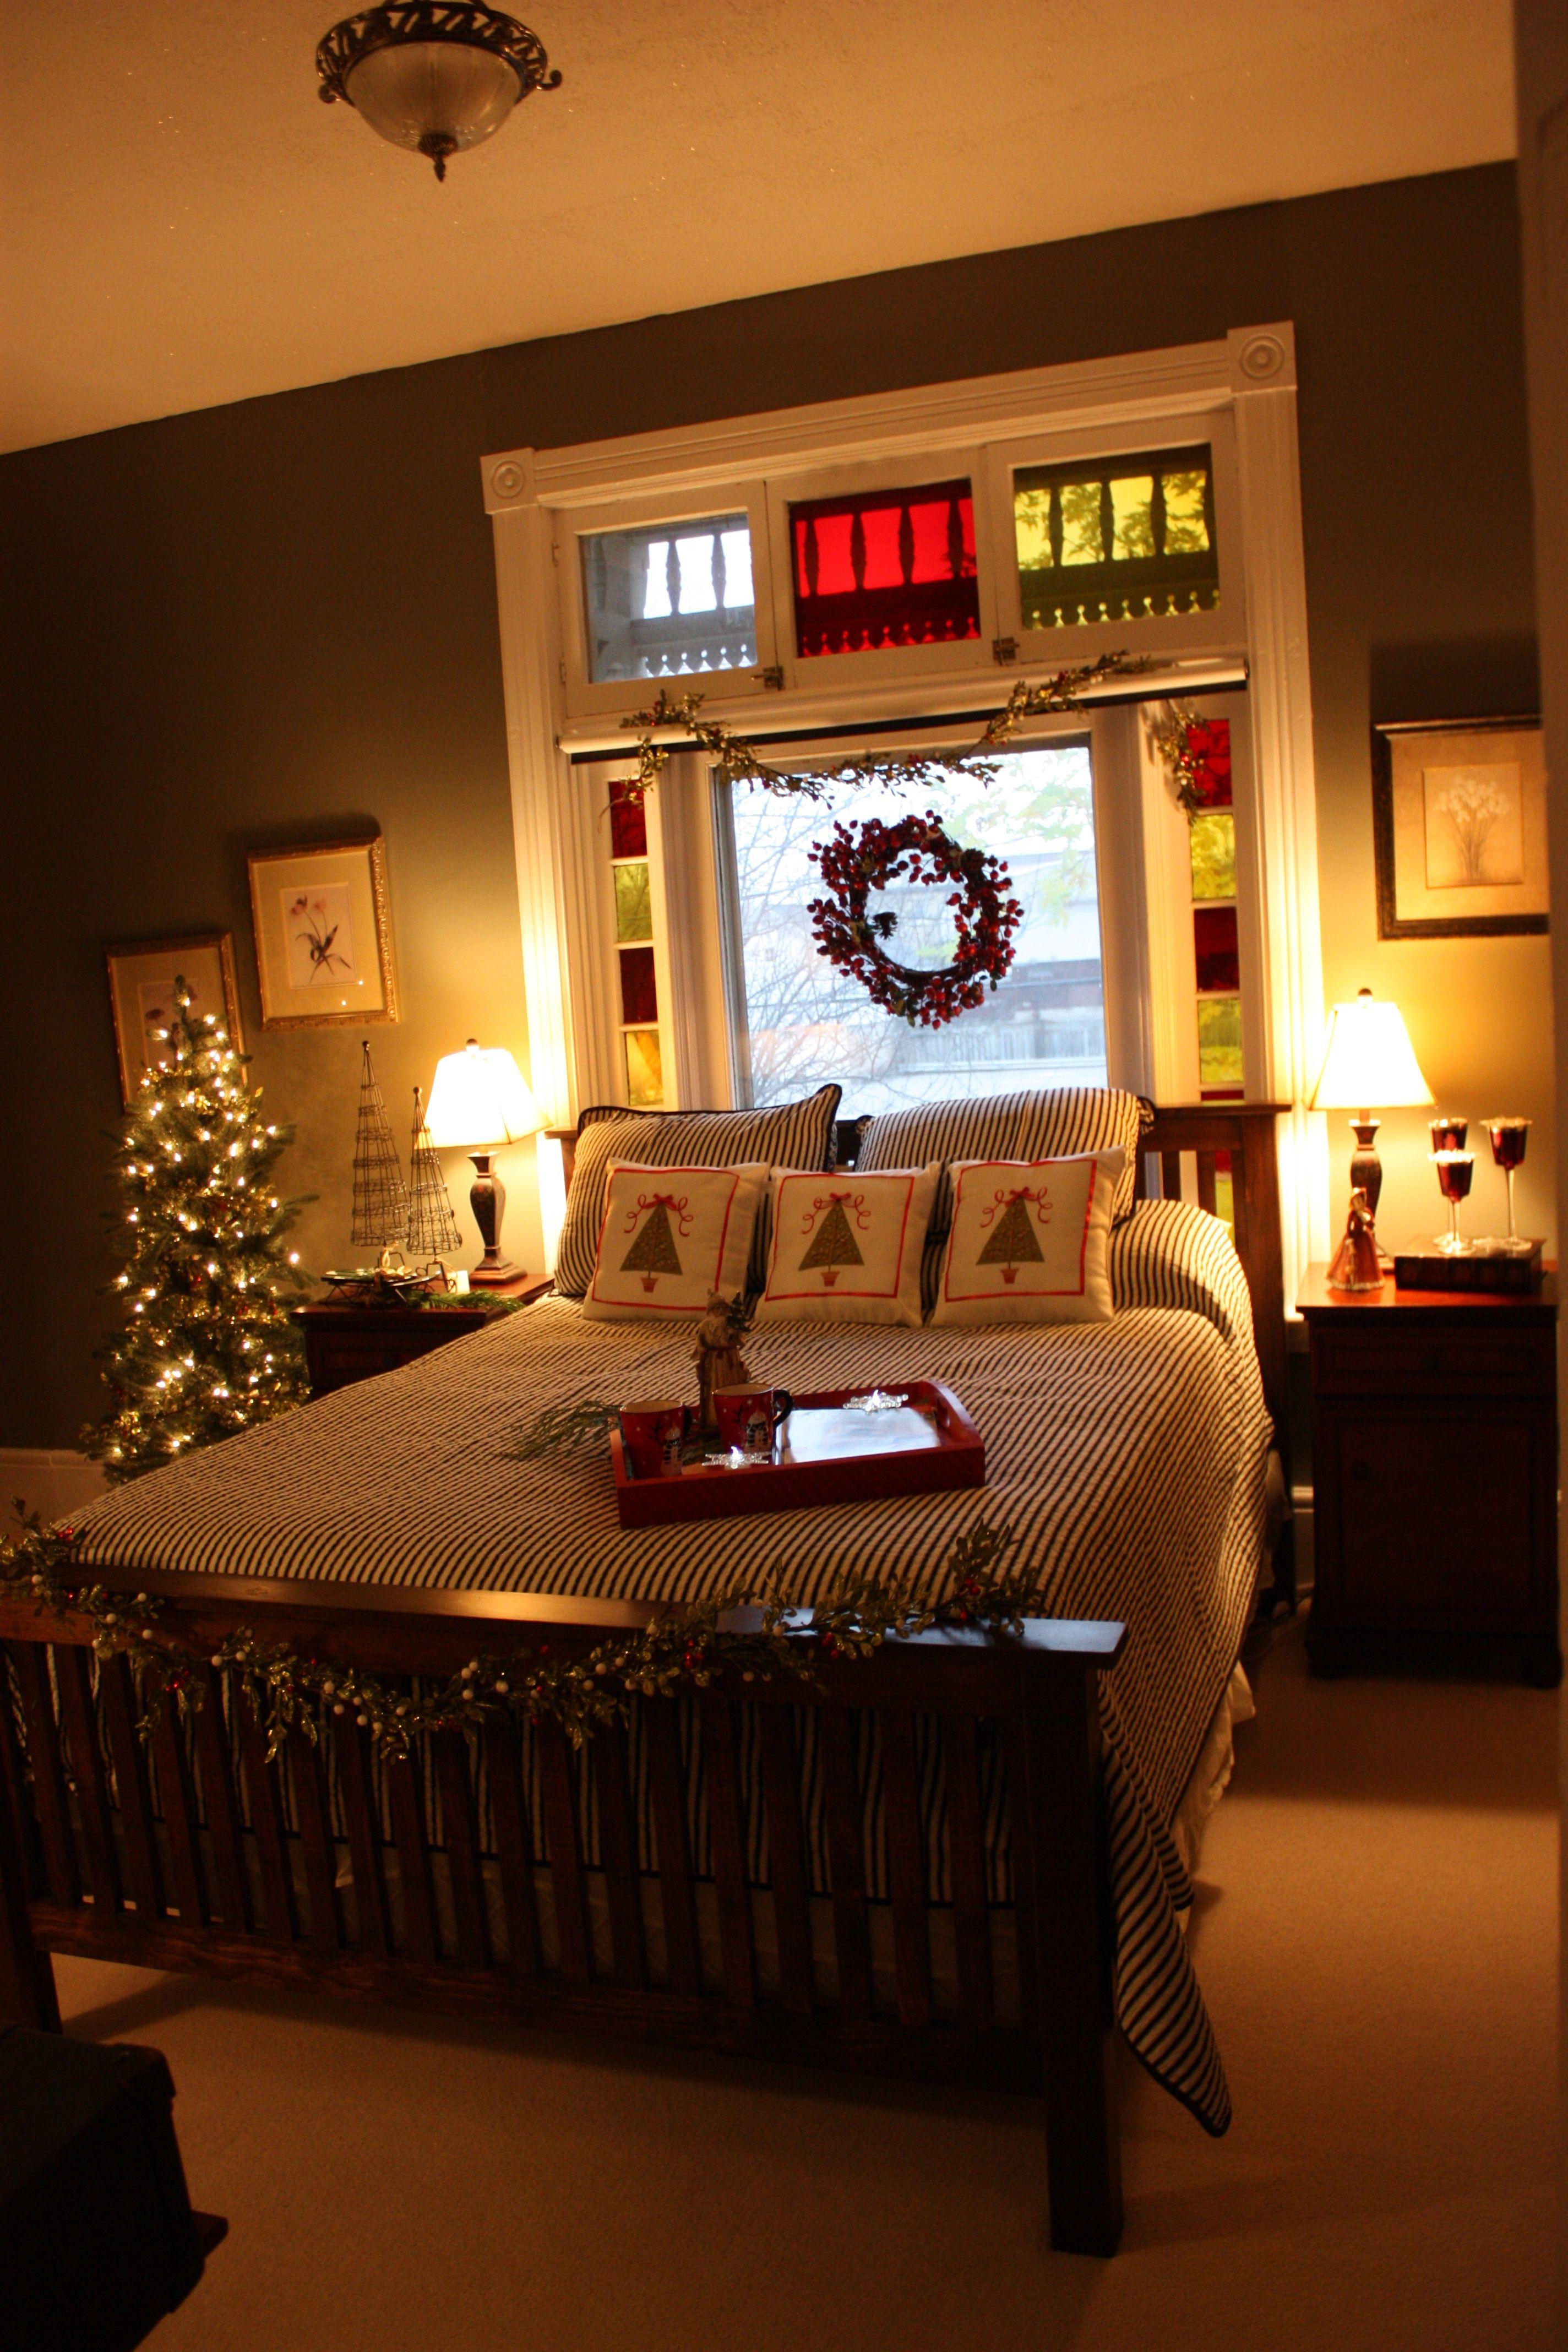 Romantic Christmas Themed Bedroom Https Hajarfresh Com Romantic Christmas Themed Bedroom Christmas Decorations Bedroom Christmas Room Decor Christmas Bedroom